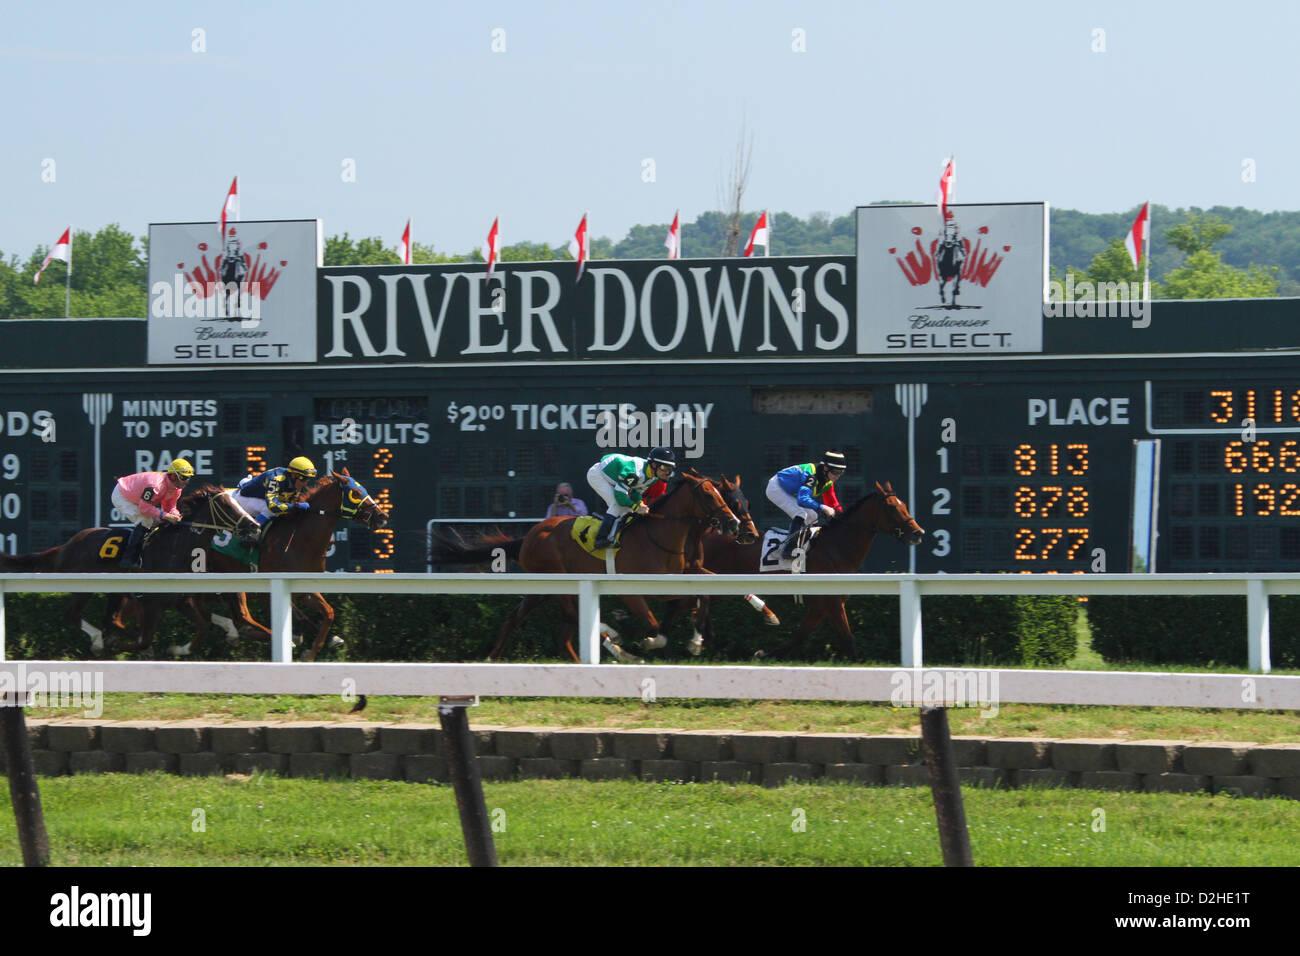 Horse Racing at River Downs track, Cincinnati, Ohio, USA. Stock Photo